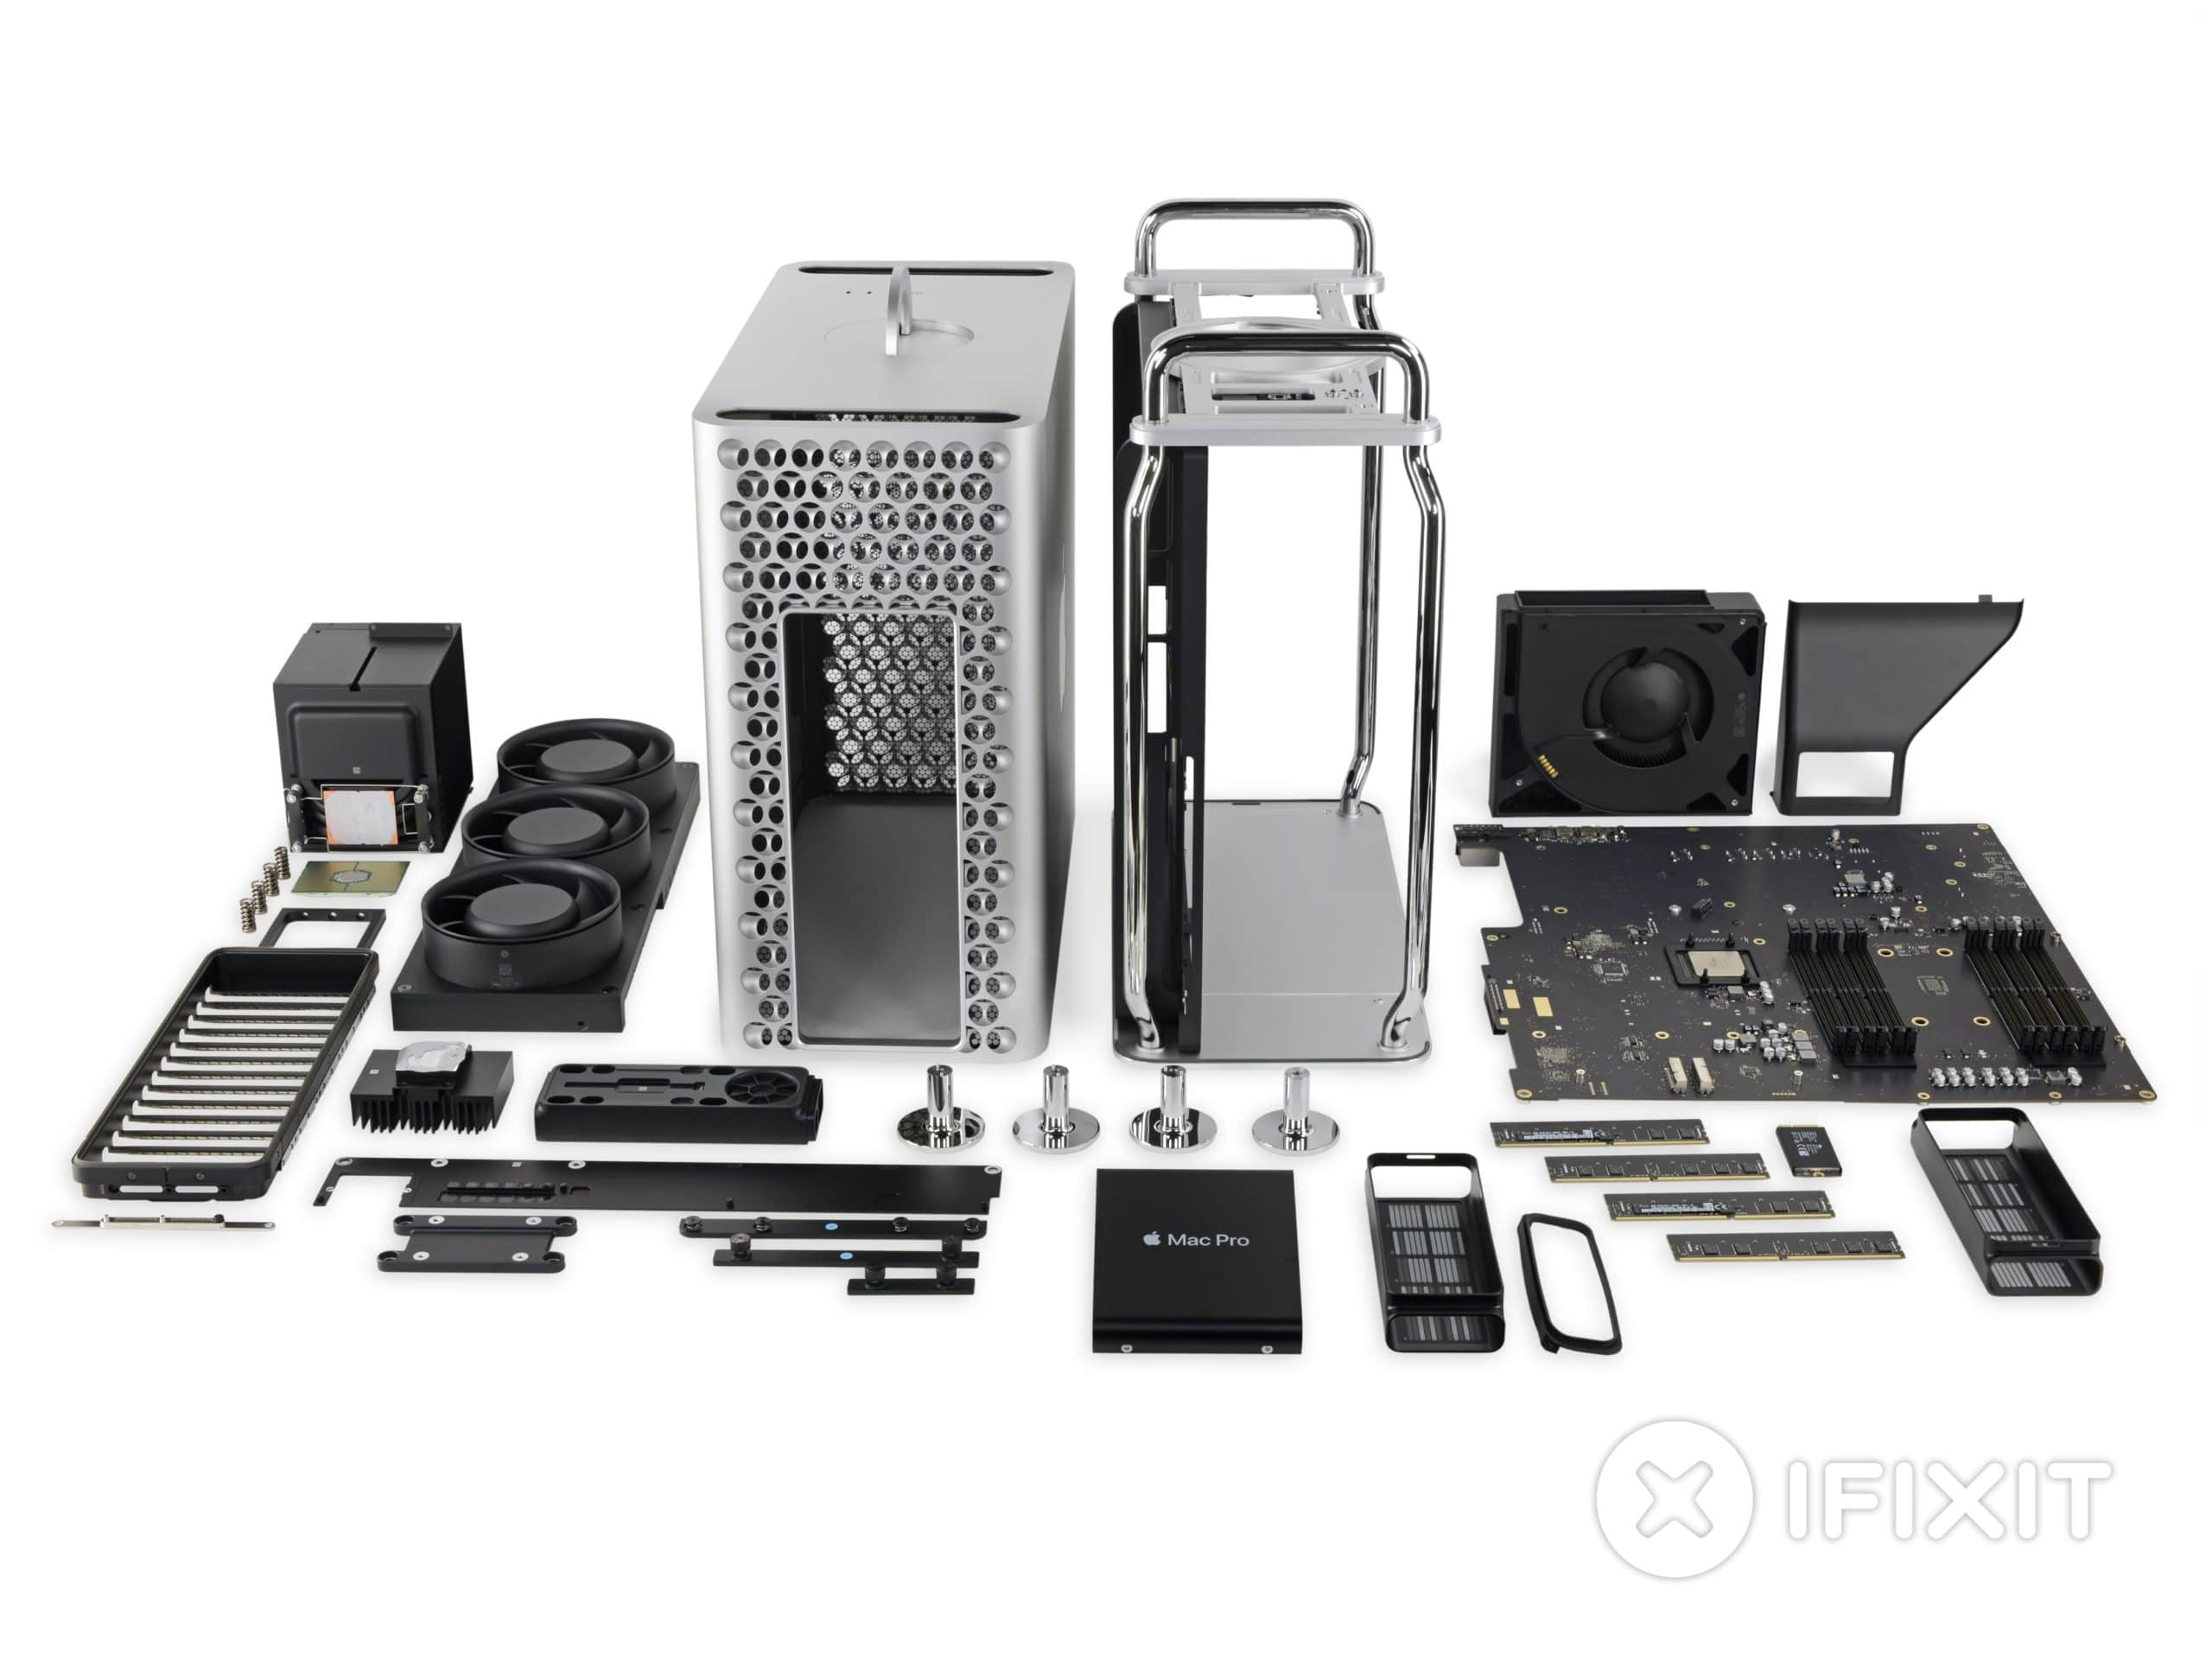 Desmonte da iFixit do novo Mac Pro